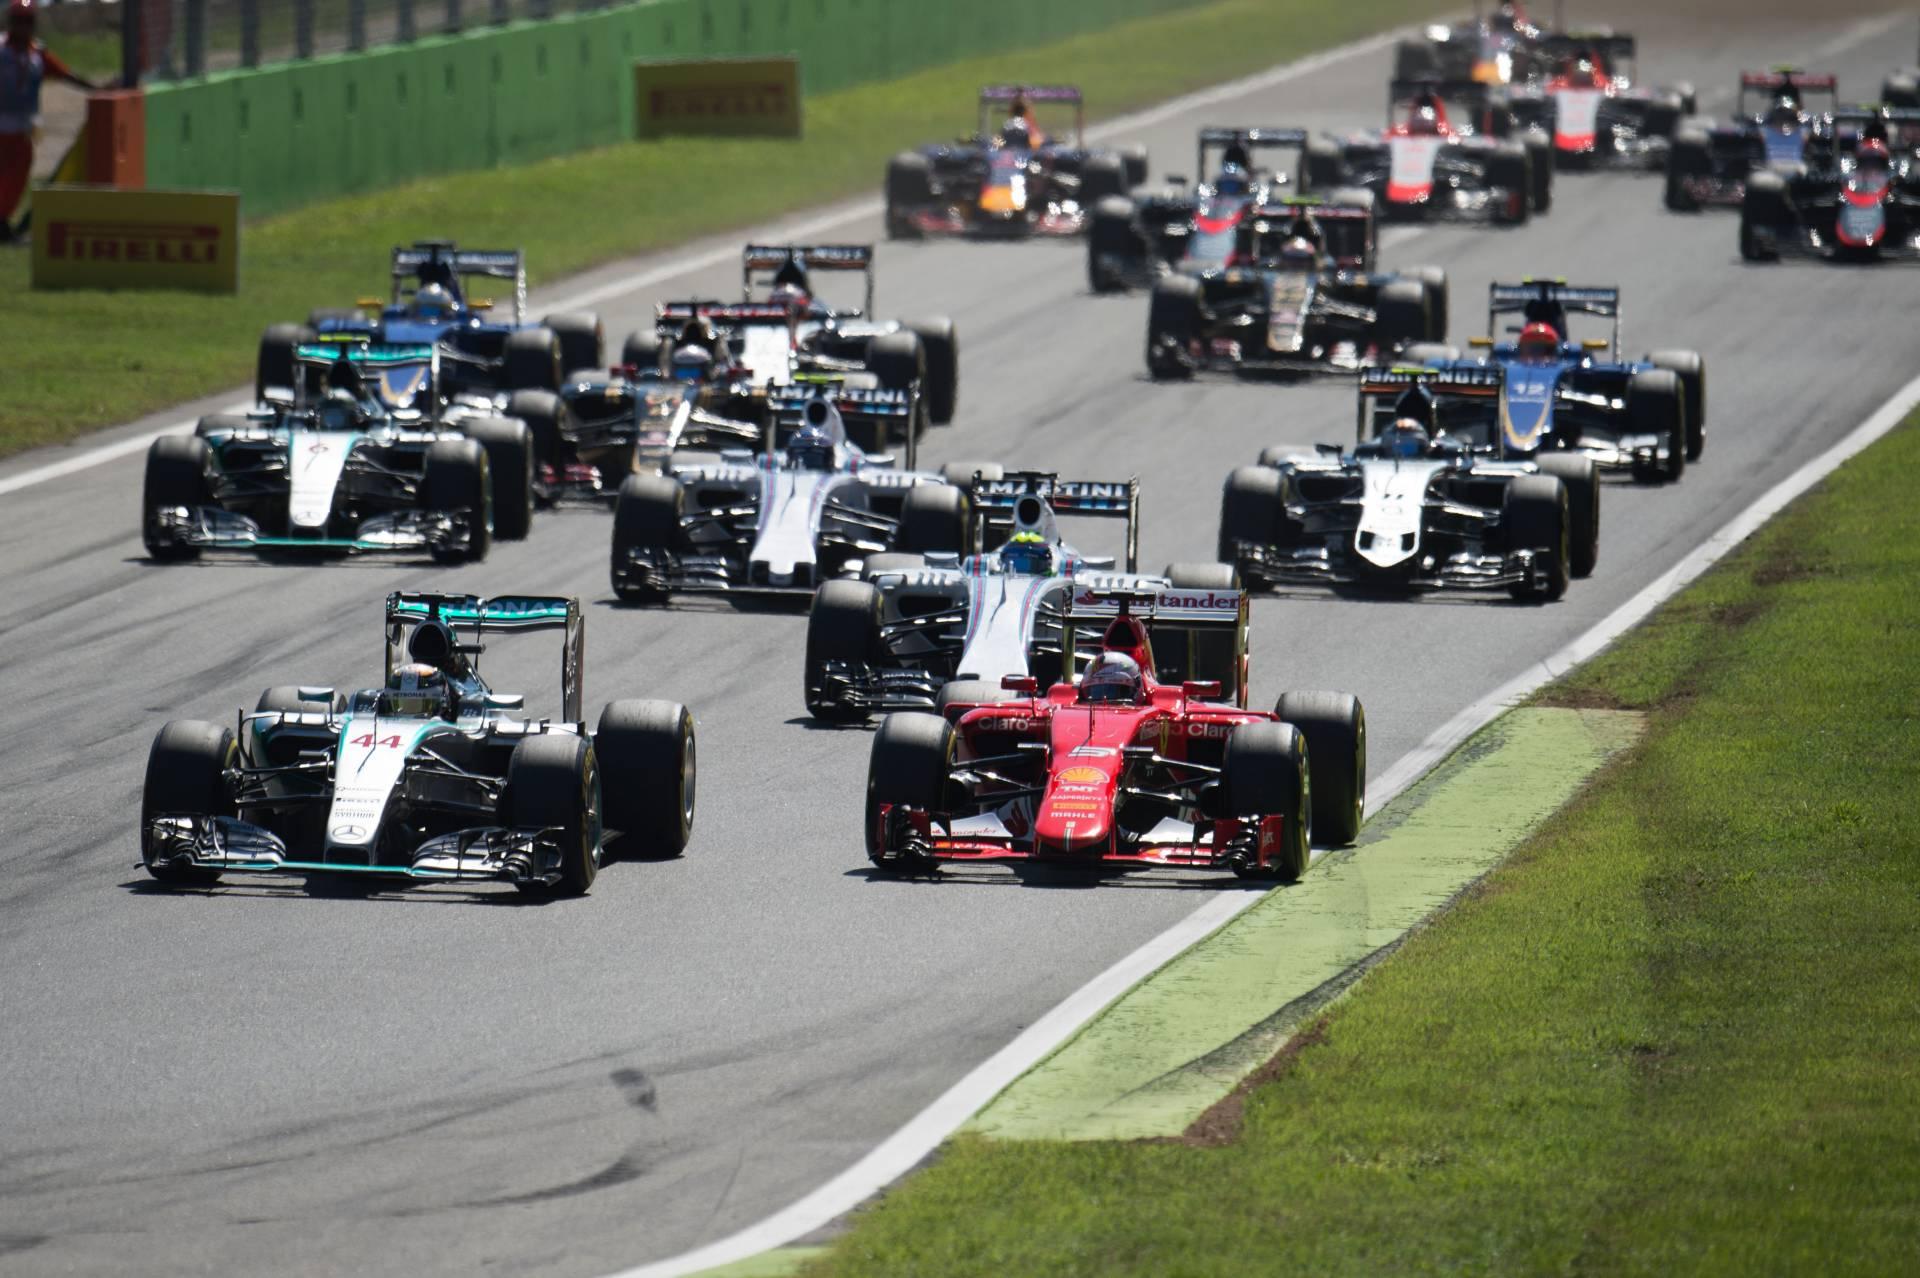 Wallpapers Italian Grand Prix of 2015